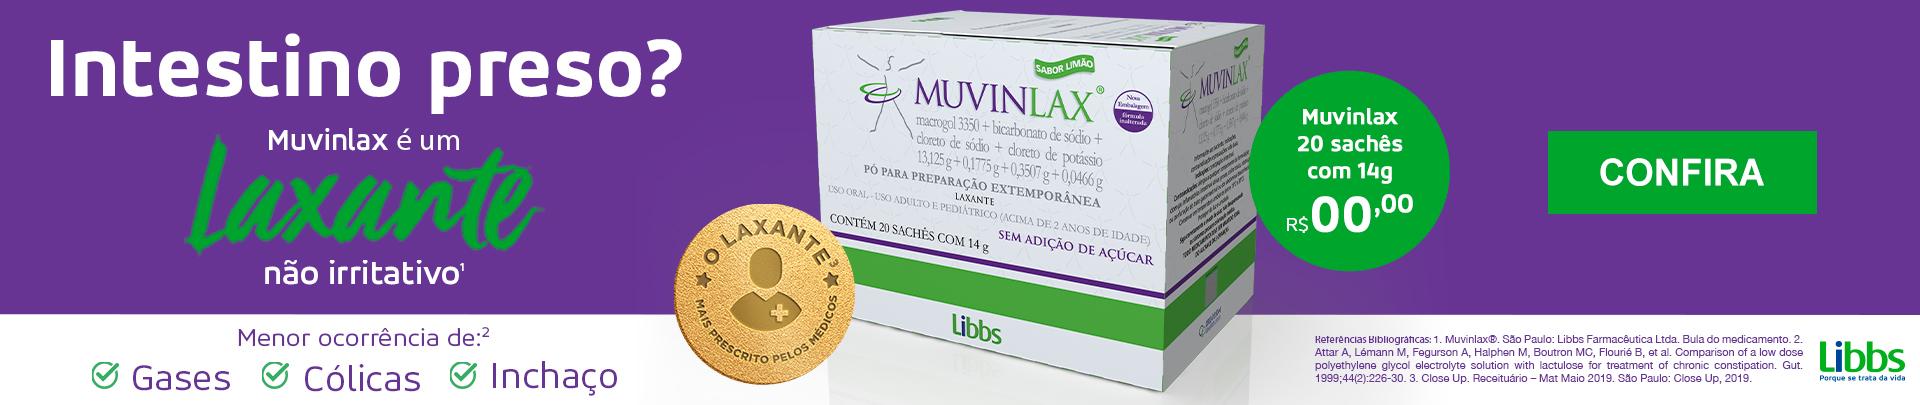 Muvinlax_Maio2021